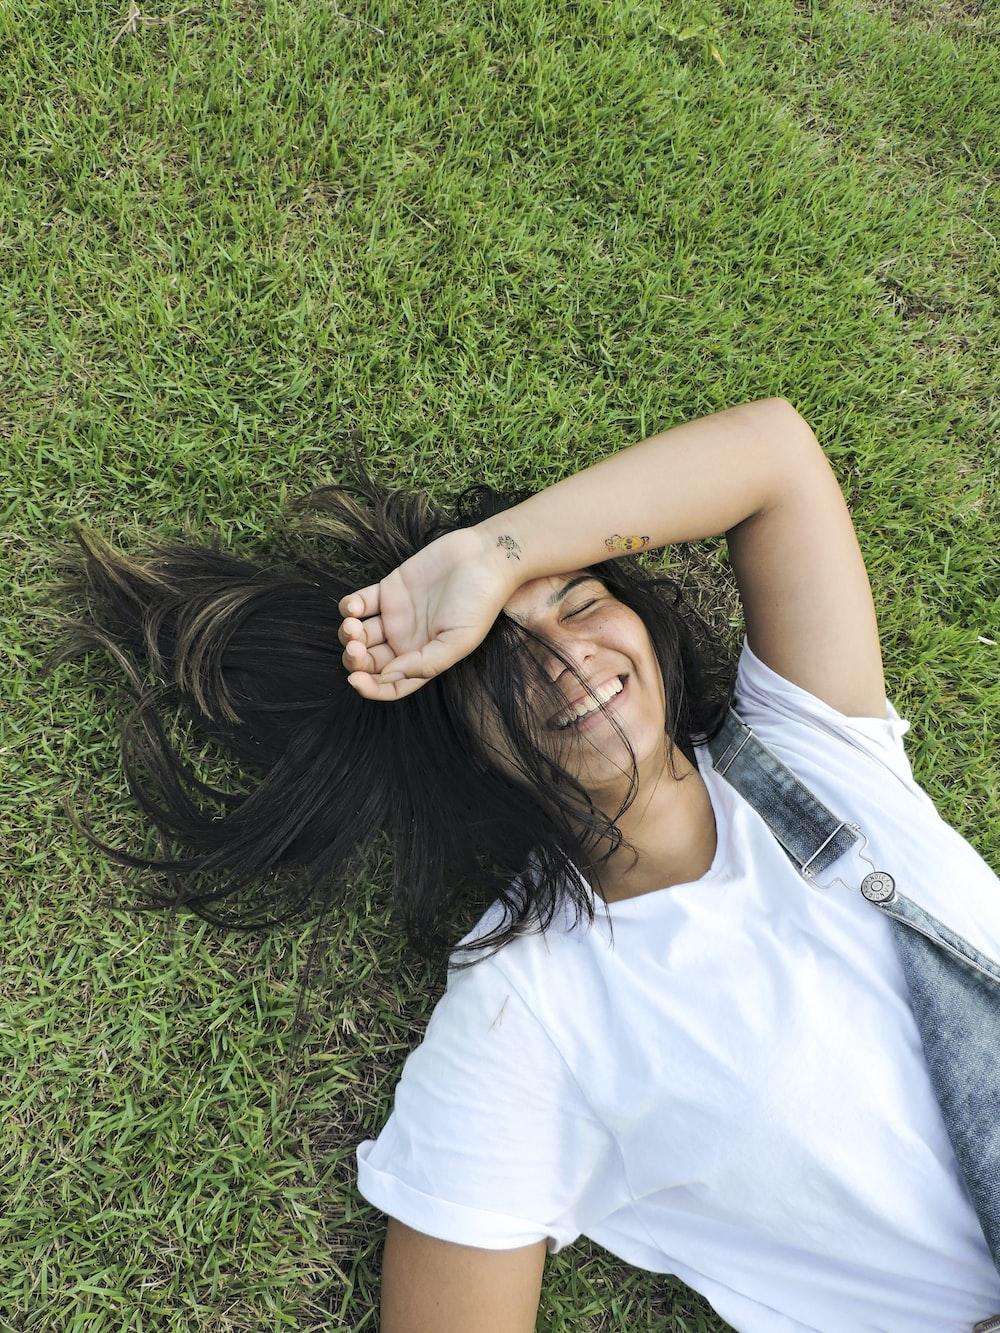 woman in white sleeveless shirt lying on green grass field